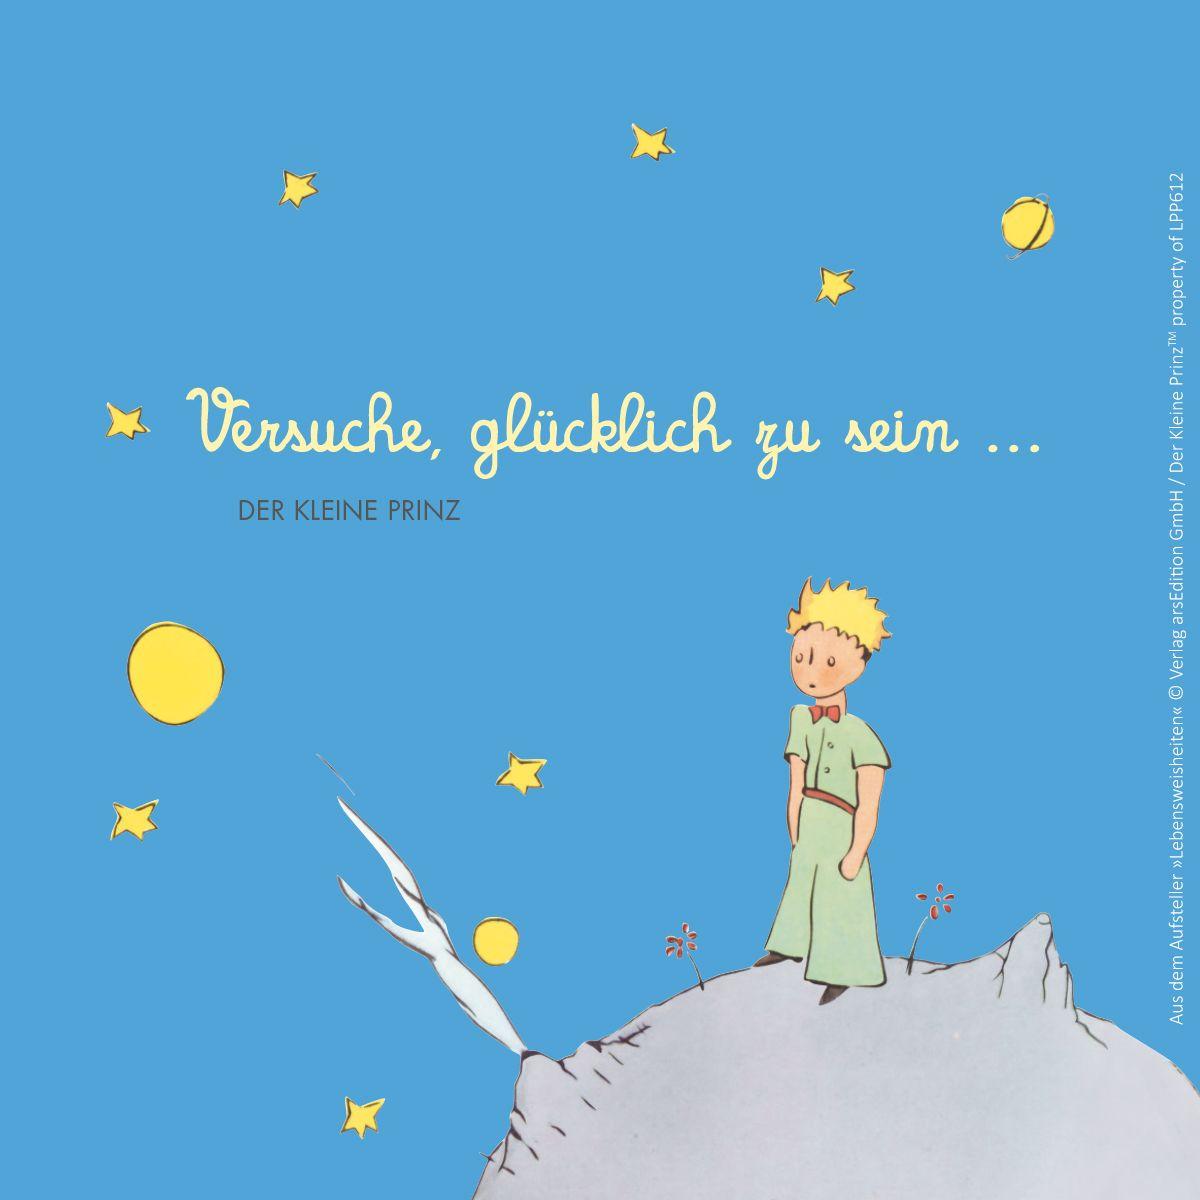 Fabulous Der Kleine Prinz Zitate Image collections - Die besten zitate Ideen UL26